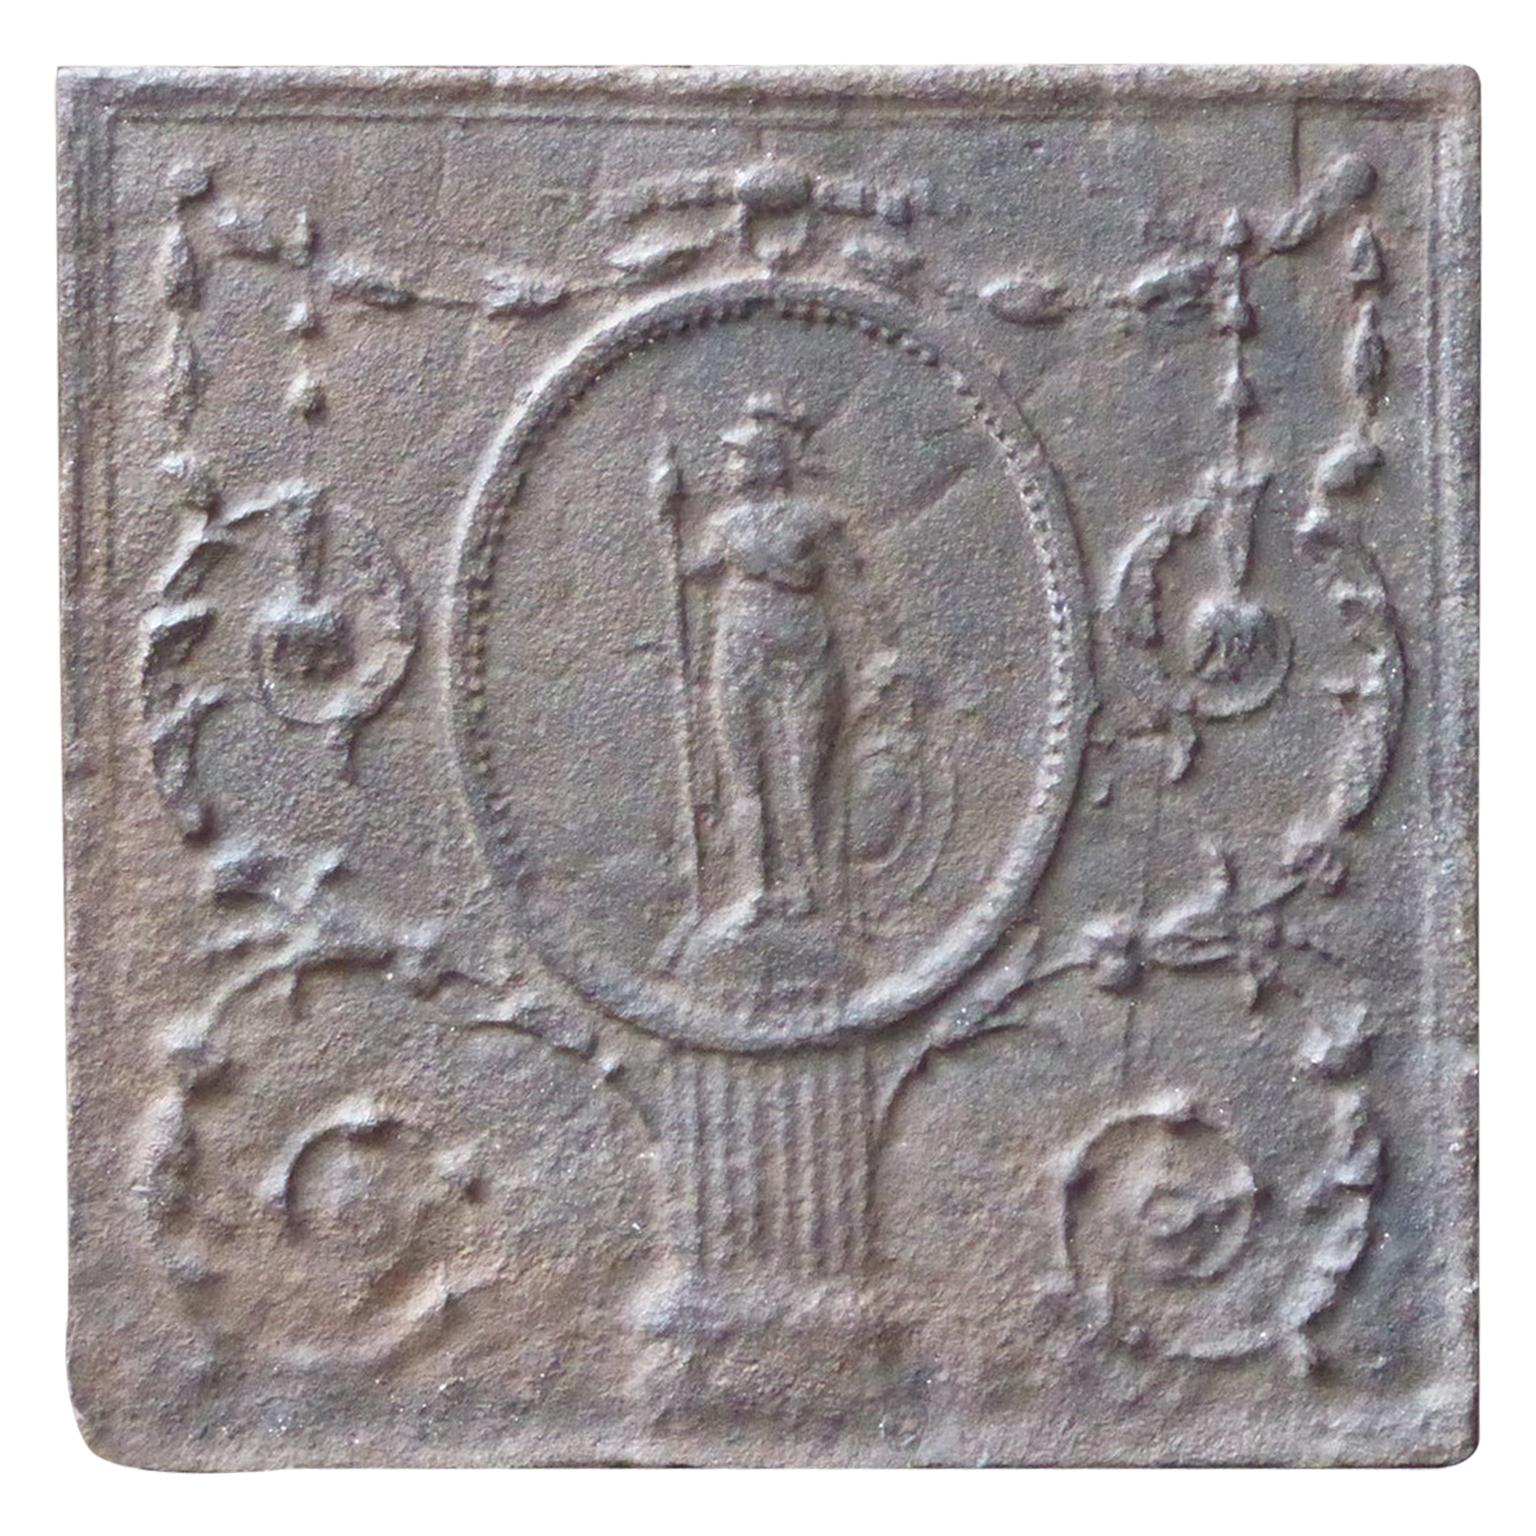 Antique French Neoclassical 'Minerva' Fireback, 18th-19th Century